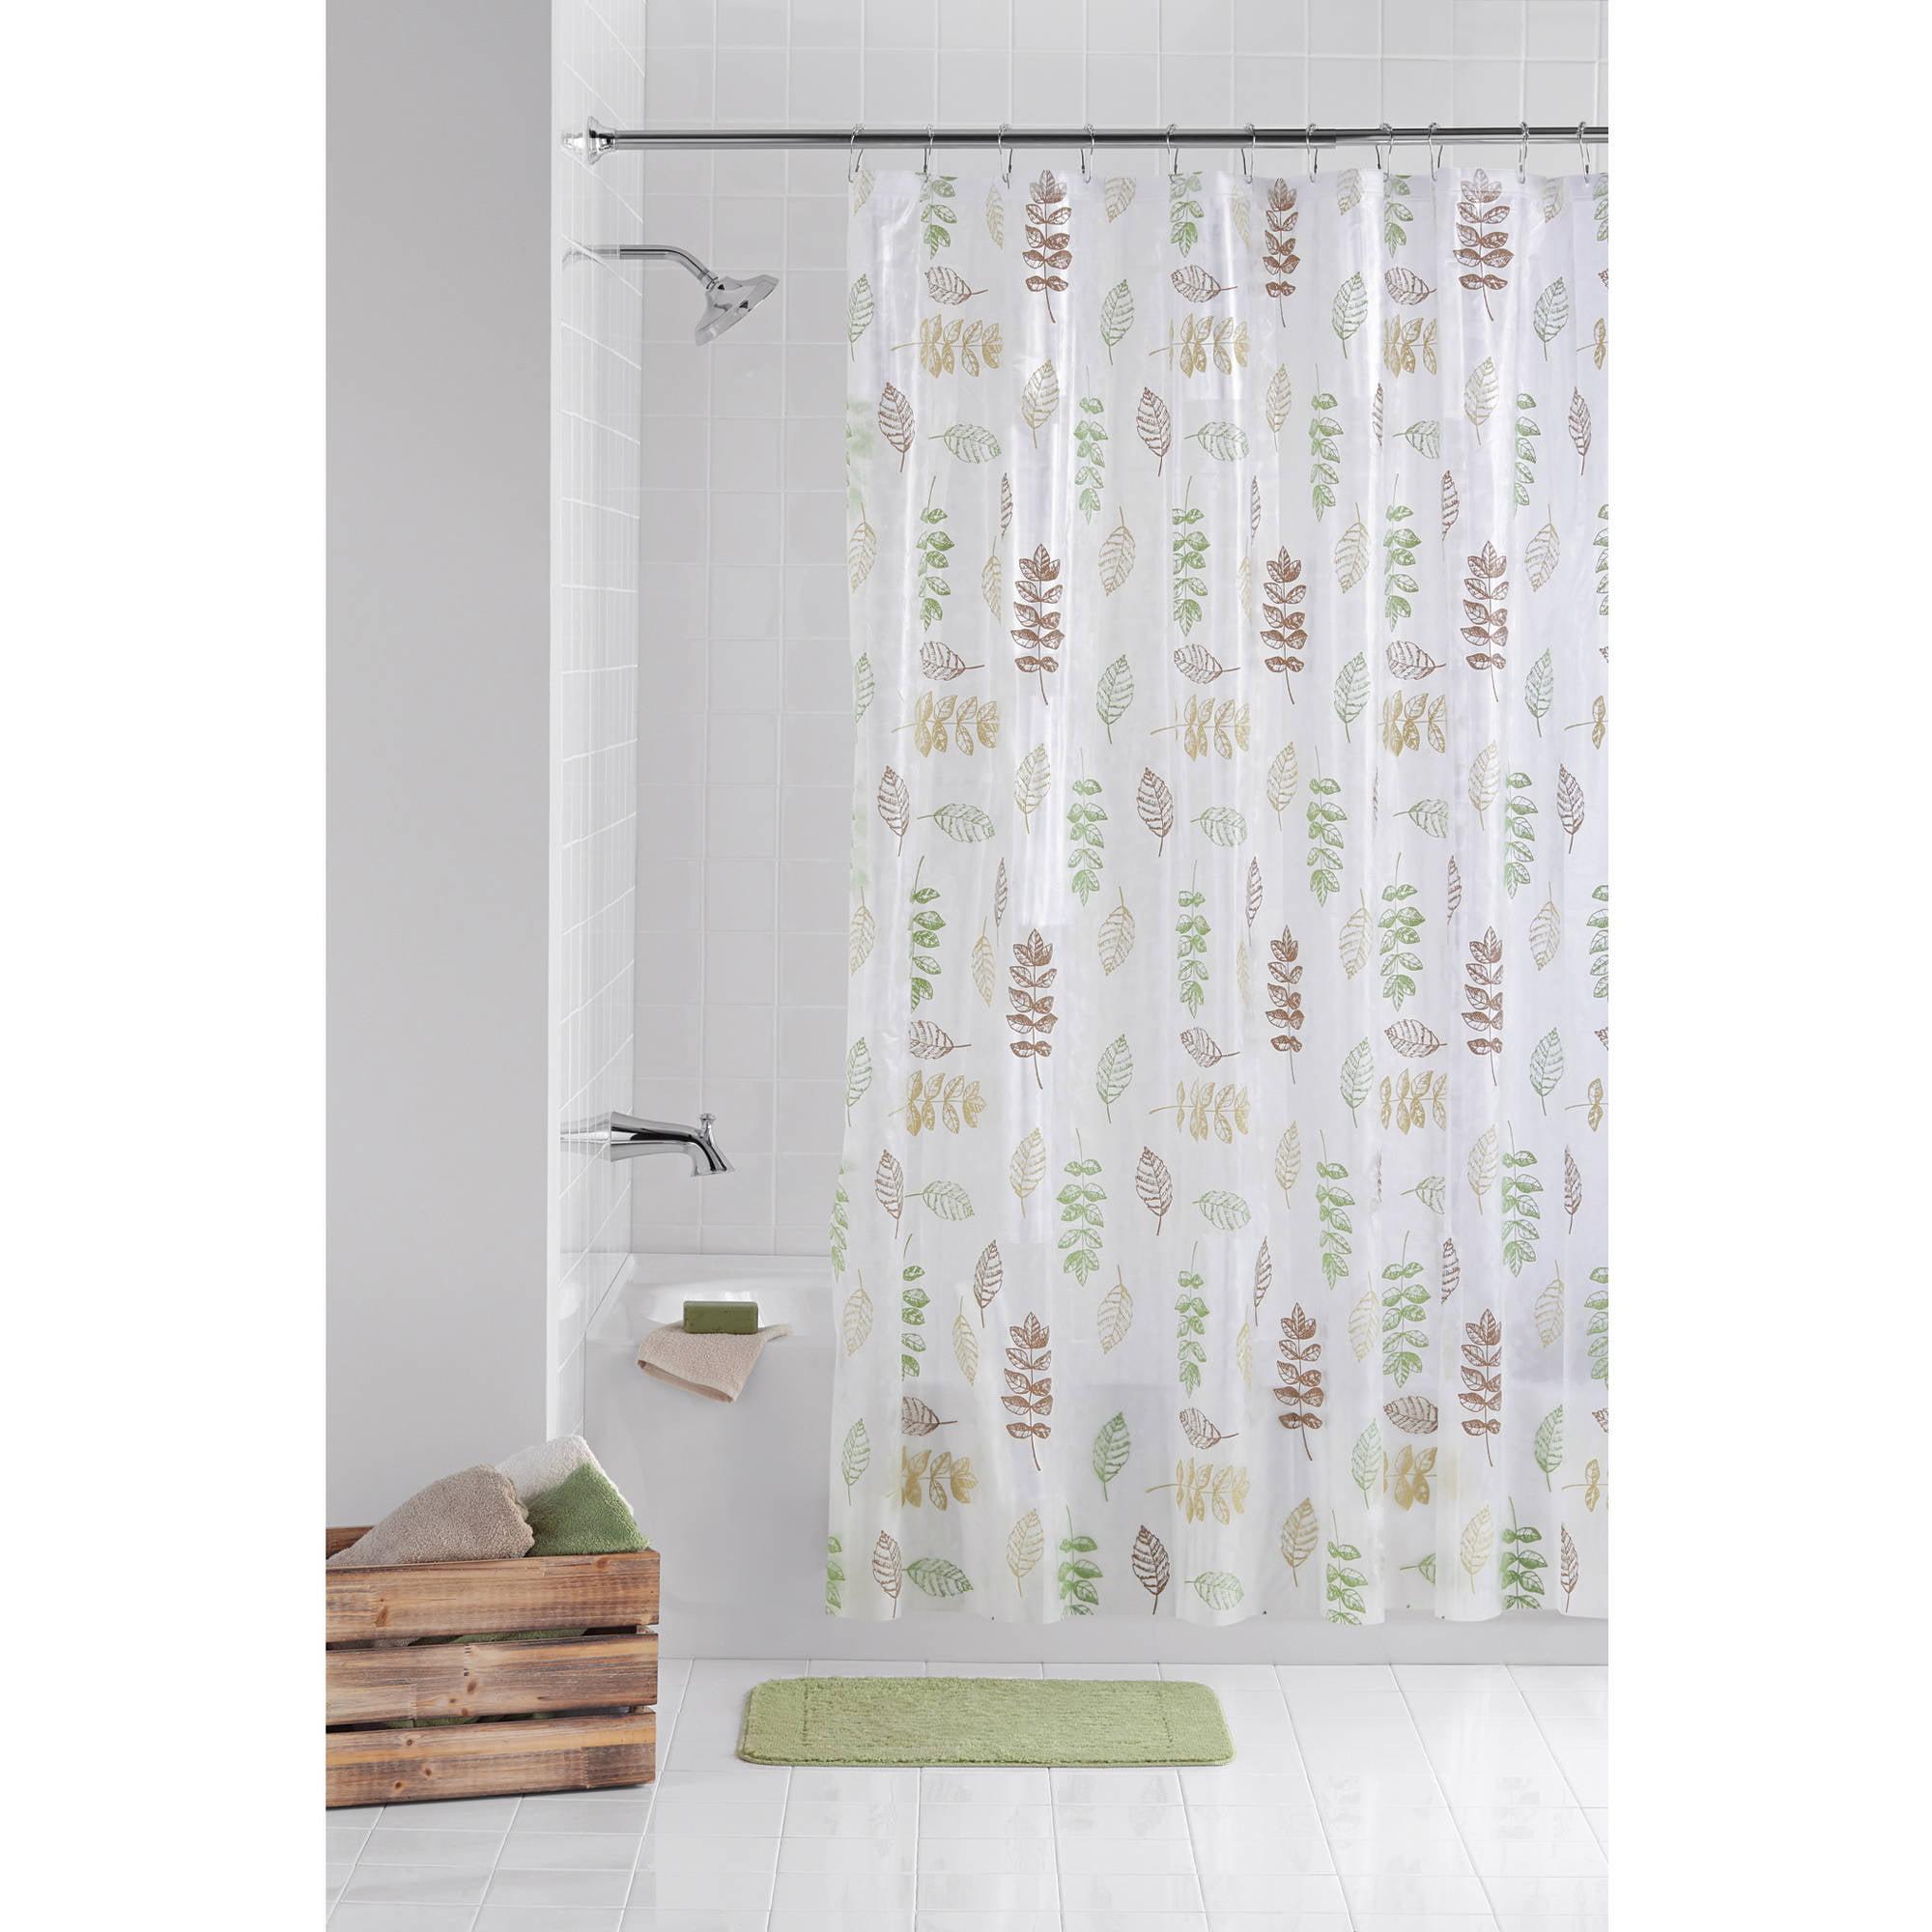 Sinatra silver shower curtain - Popular Bath Sinatra Silver Collection 70 X 72 Bathroom Shower Curtain Walmart Com